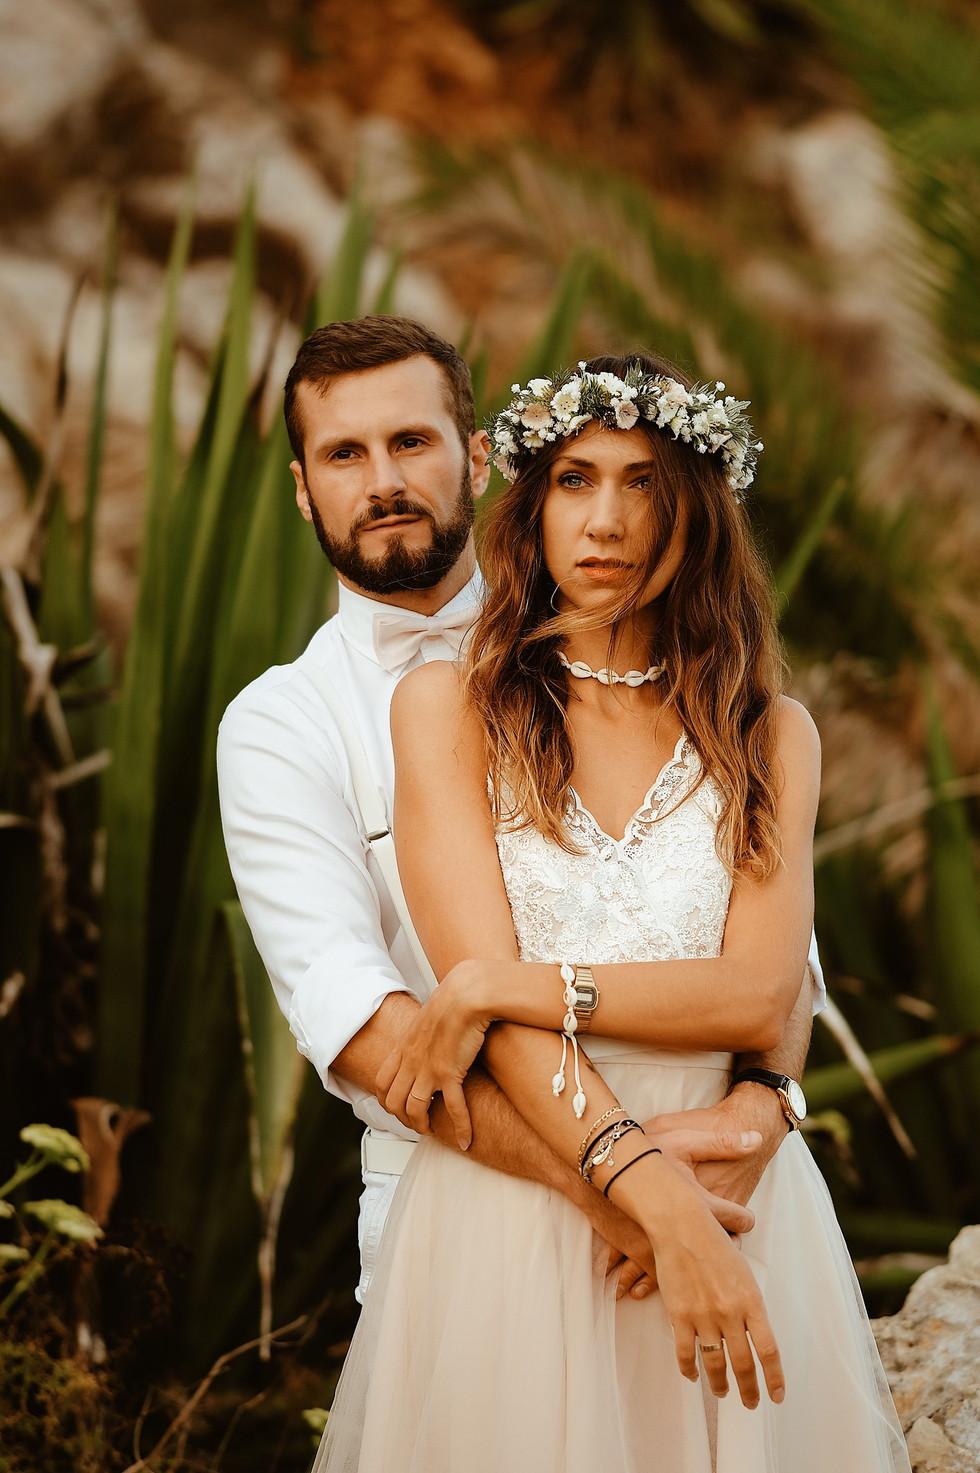 Wedding Photographer Malta - 8.jpg